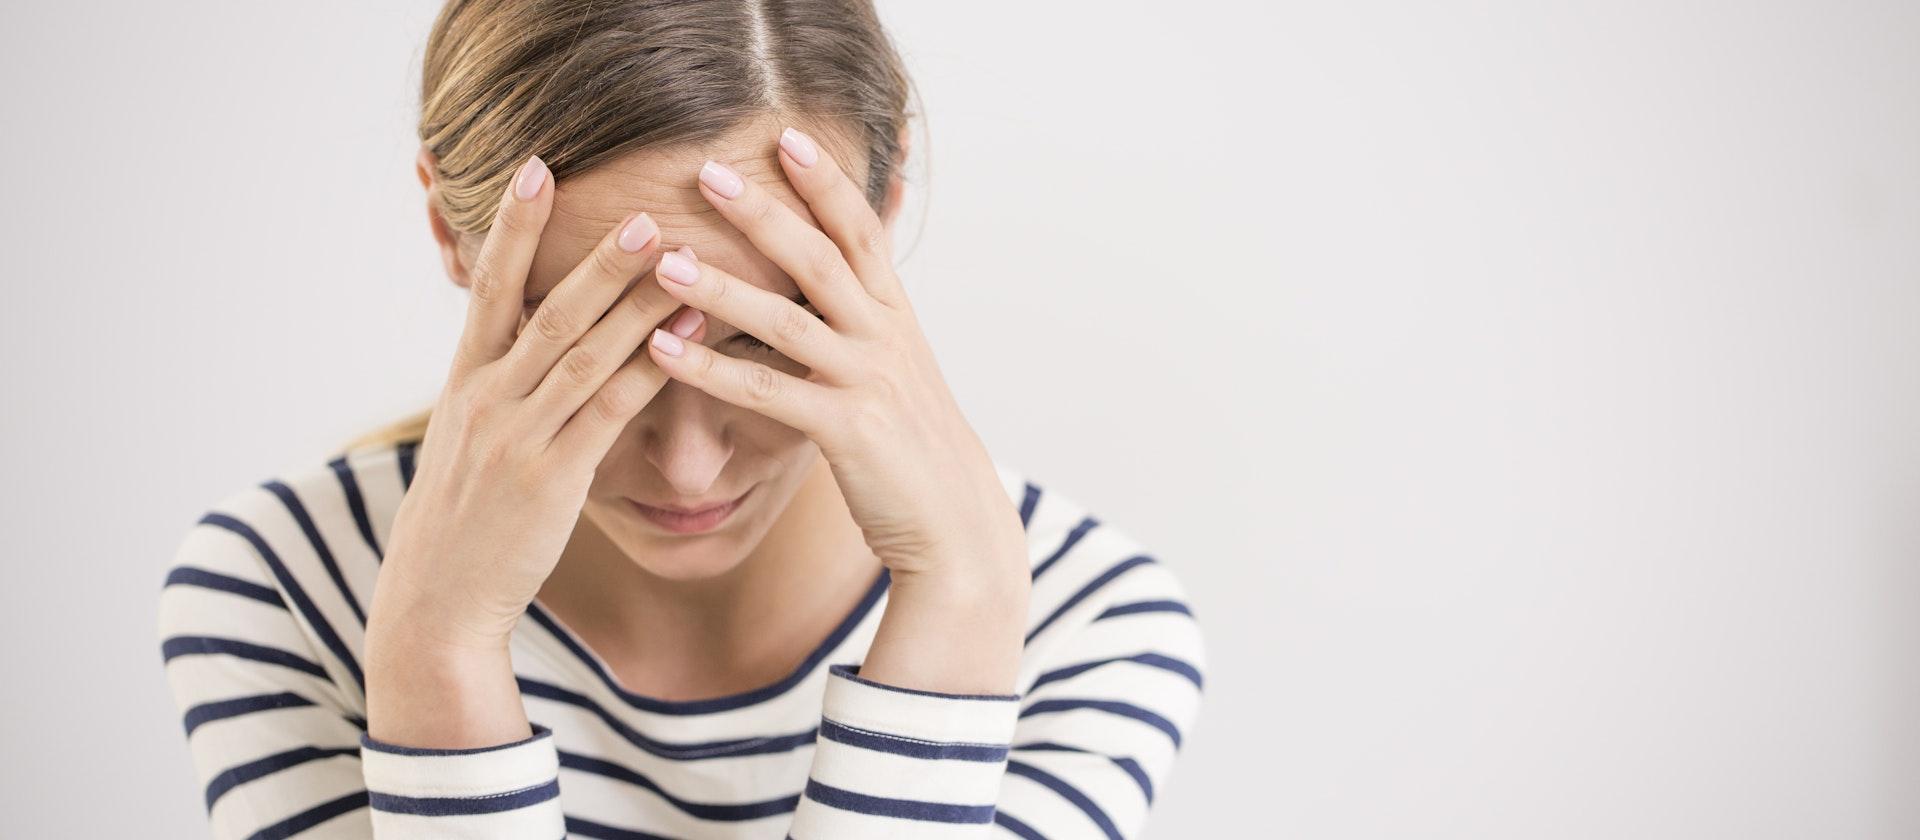 Dizziness After Migraine